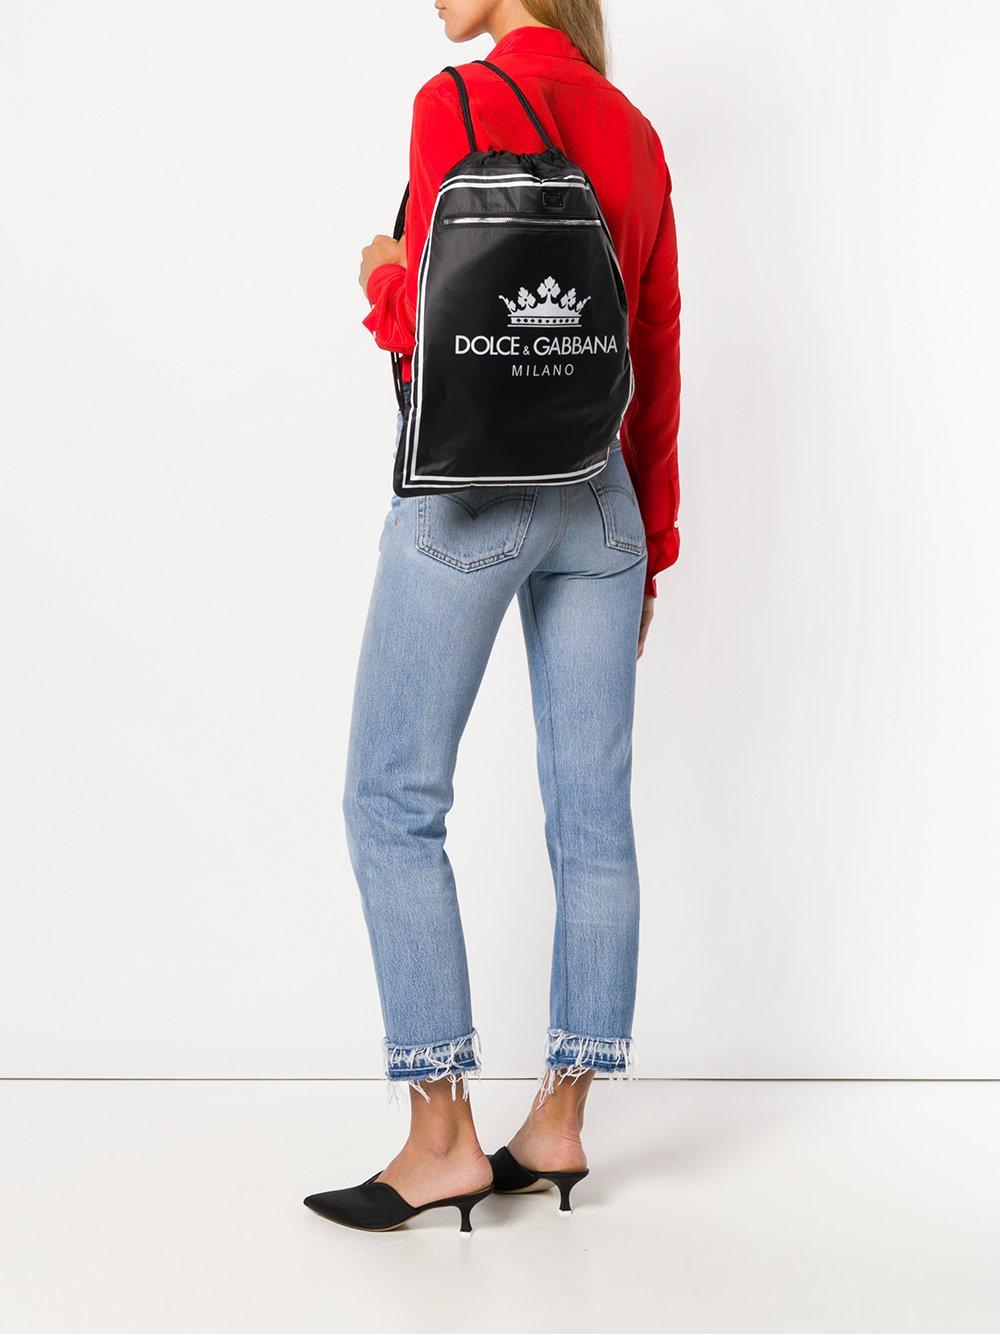 Dolce & Gabbana Leather Drawstring Logo Backpack in Black